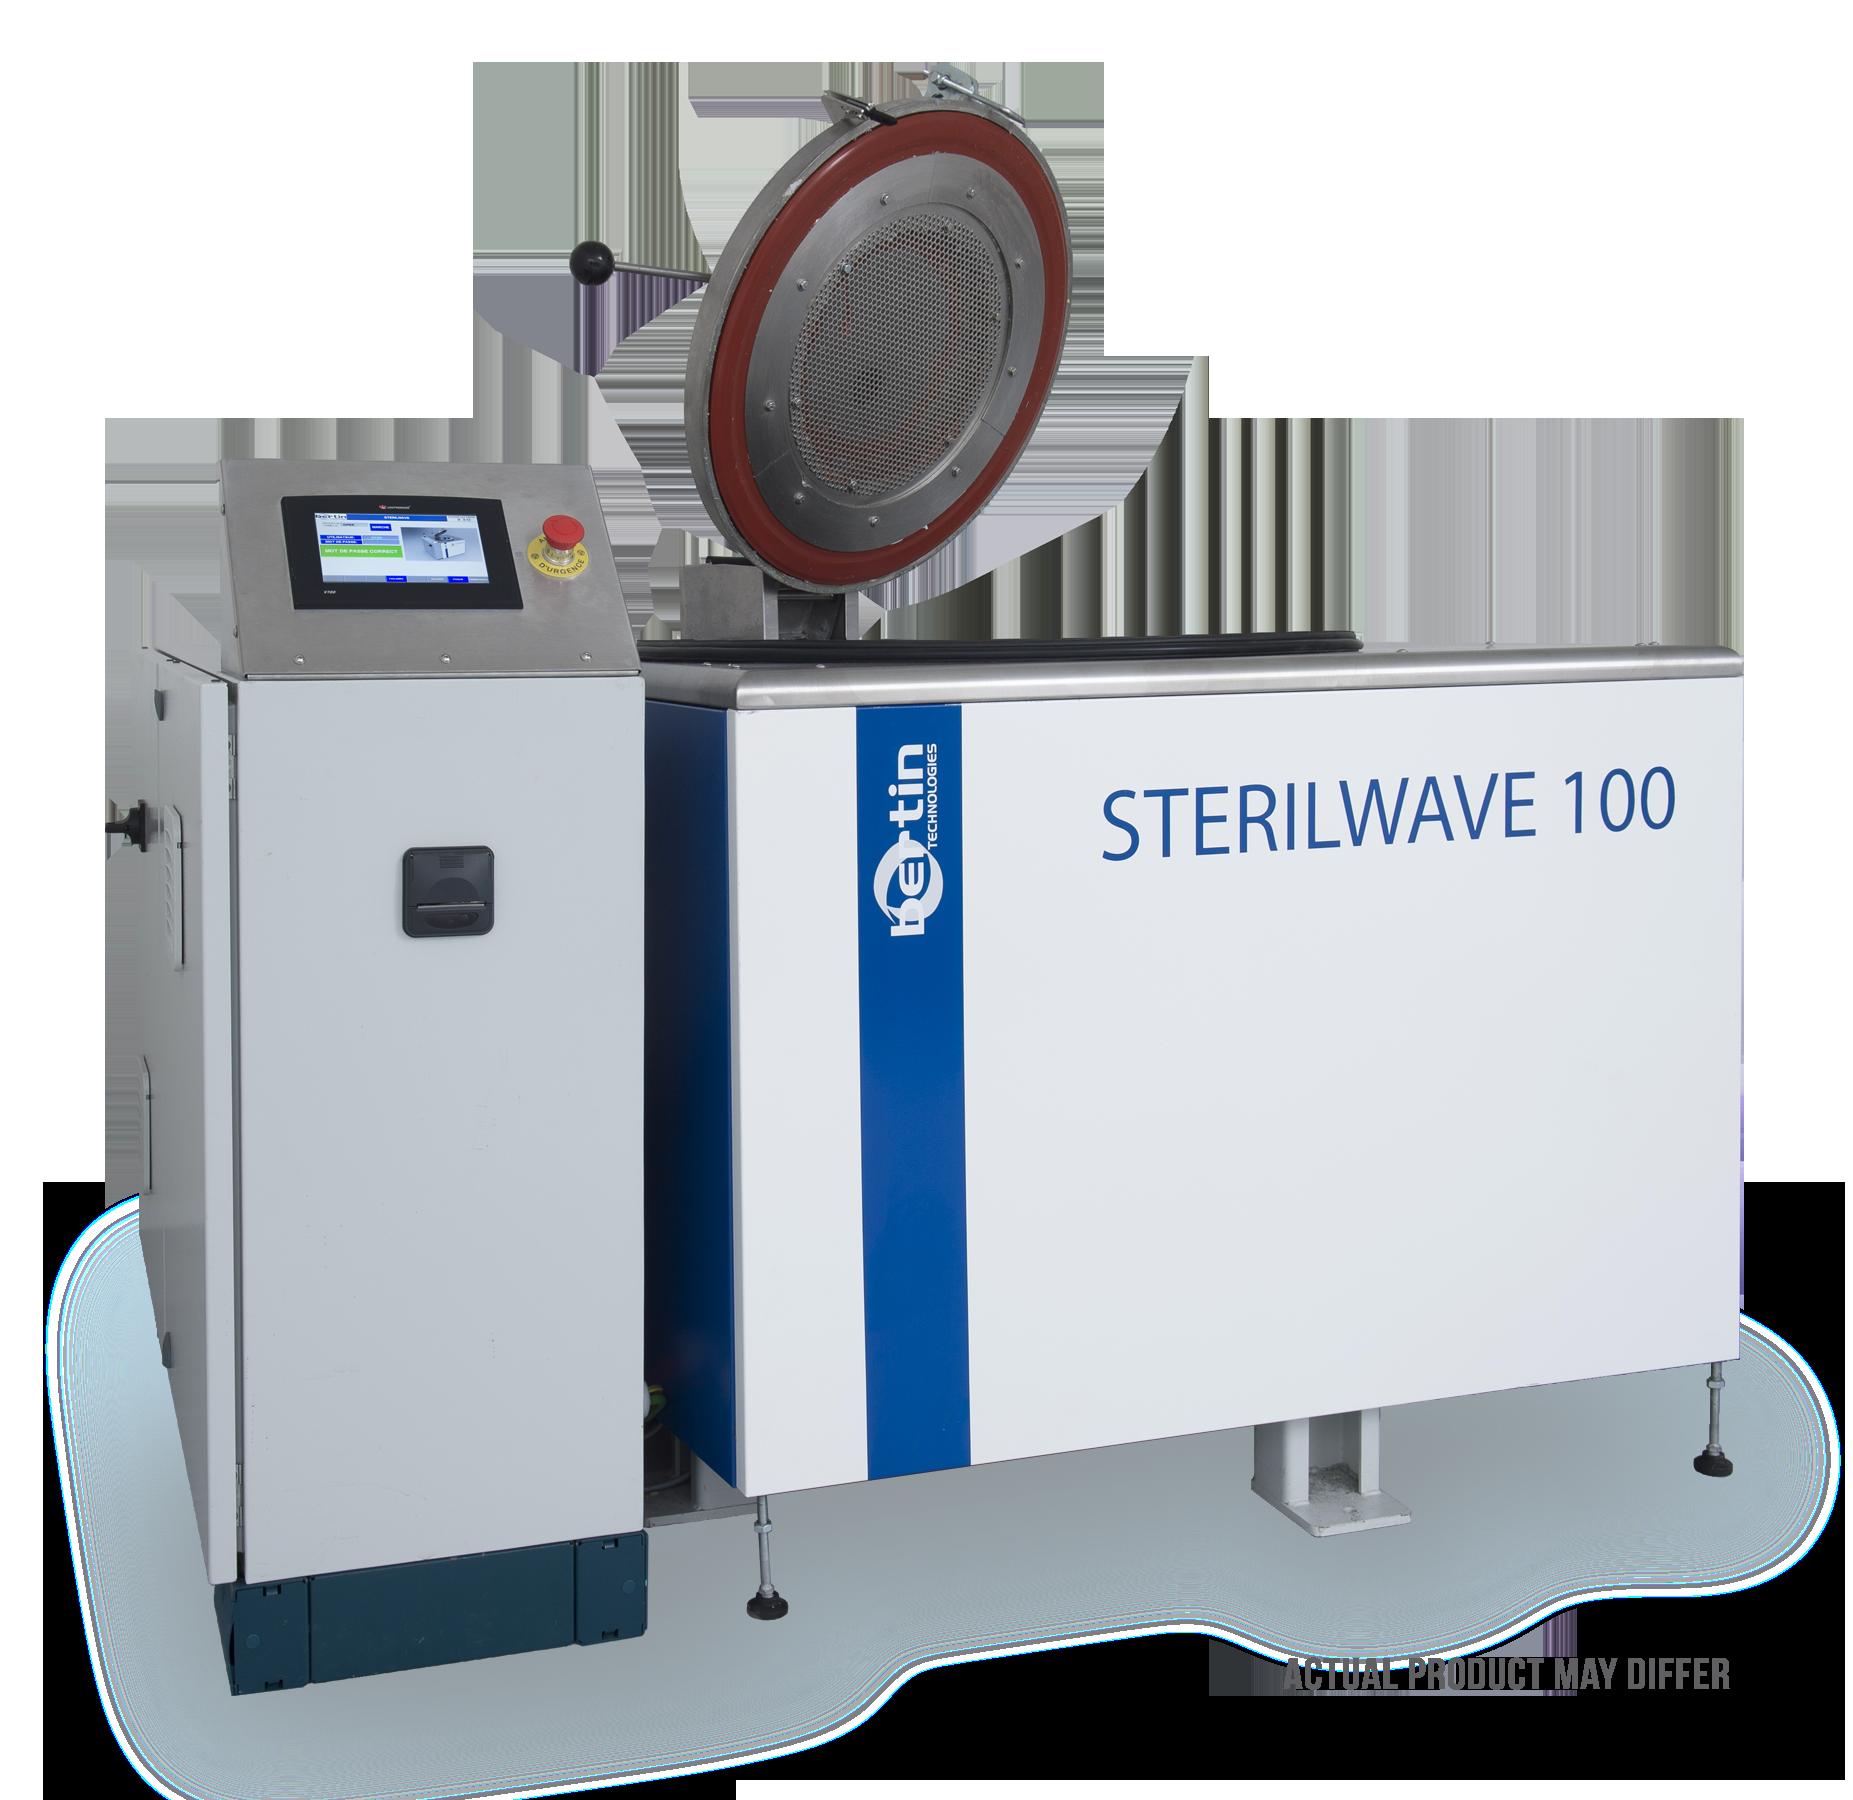 Hazard waste disposal Biomedical waste disposal Sterilwave 100